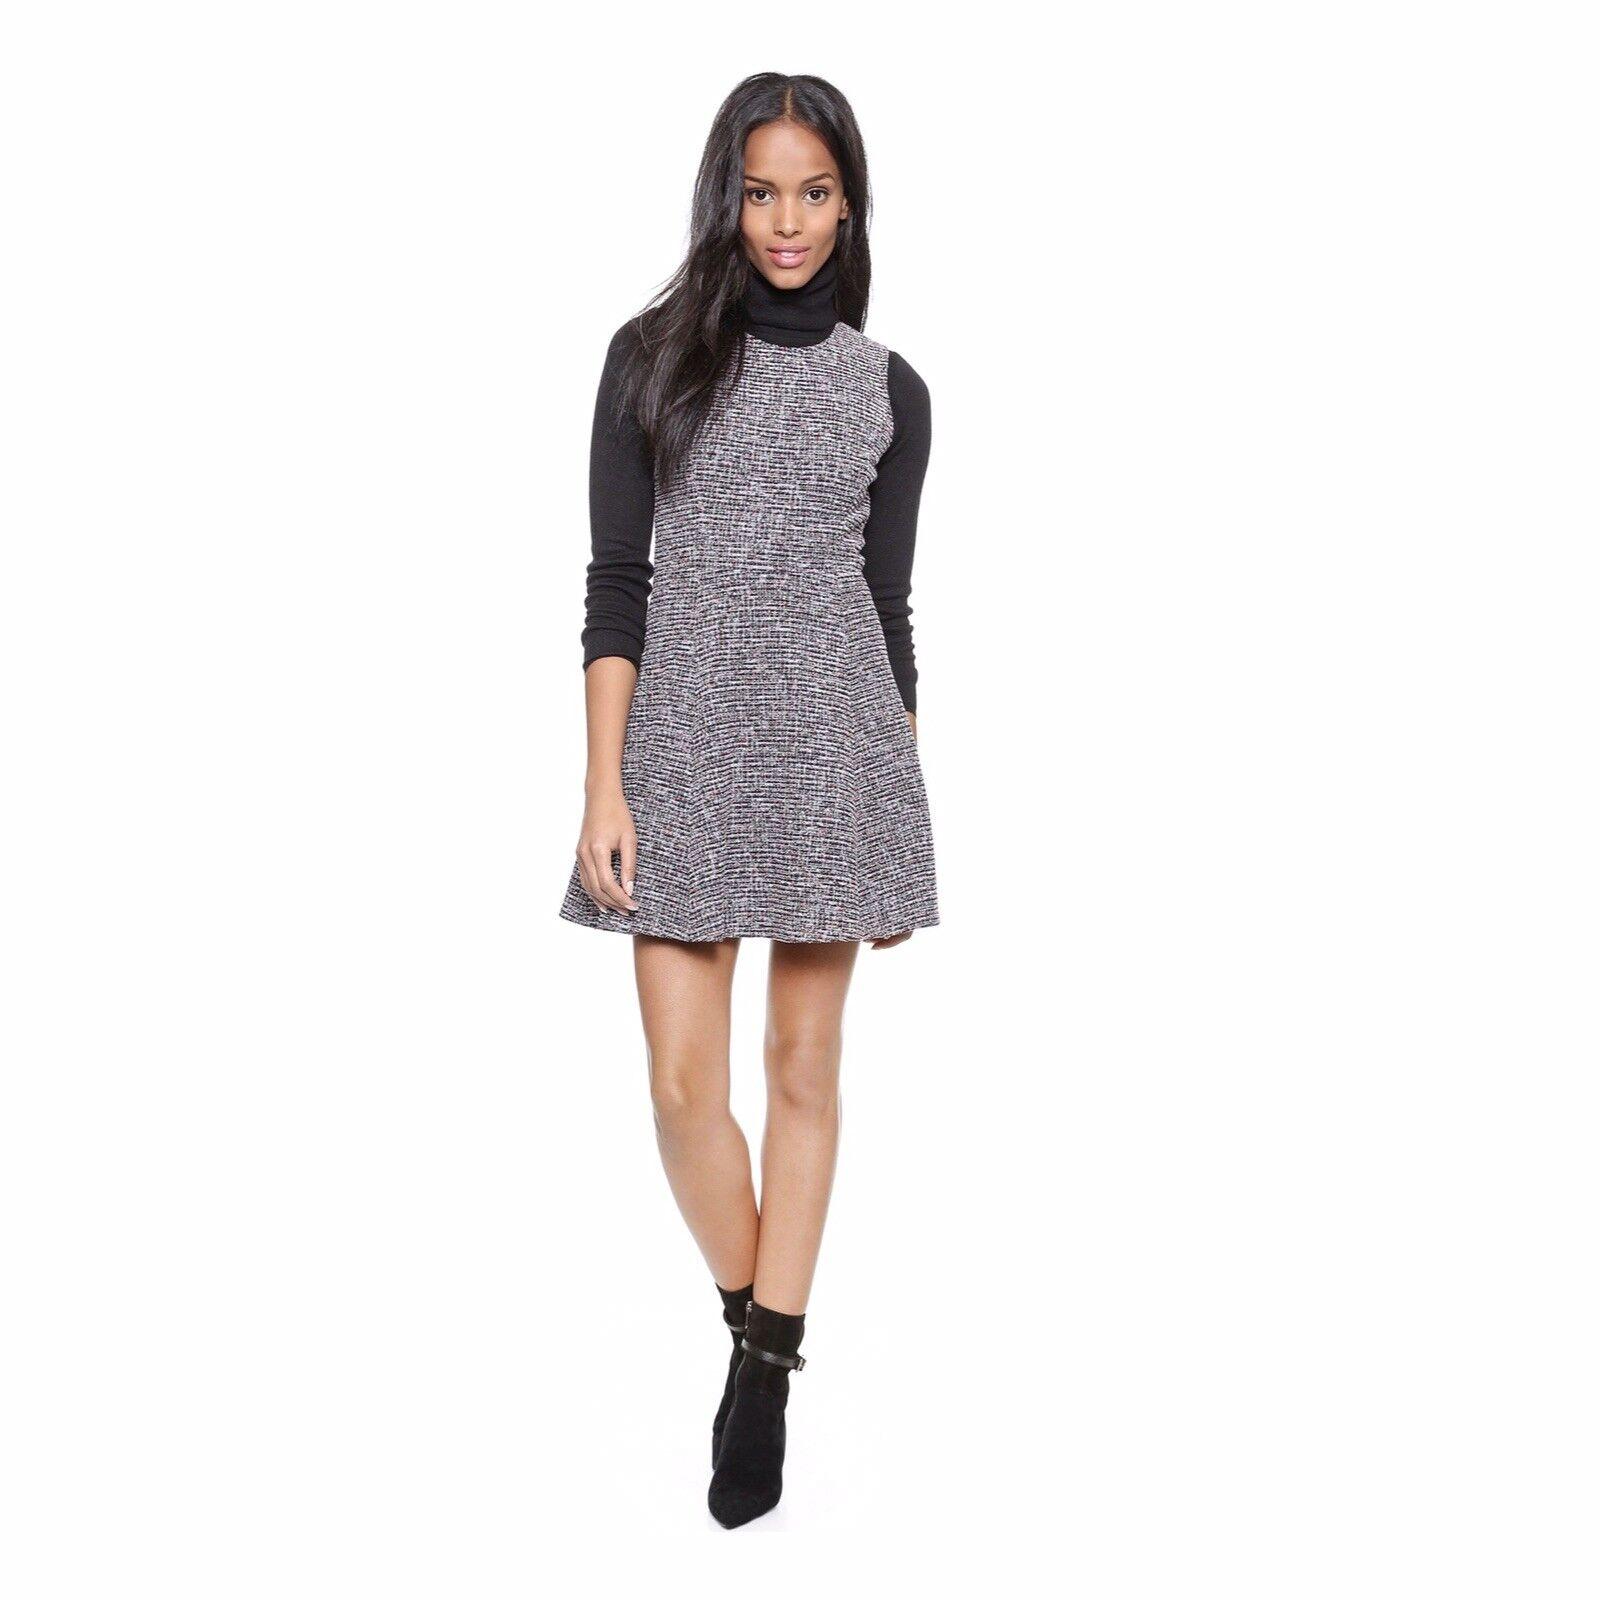 Theory Navy Blau Bkack Weiß And Metallic Tweed Mini Dress Größe 6